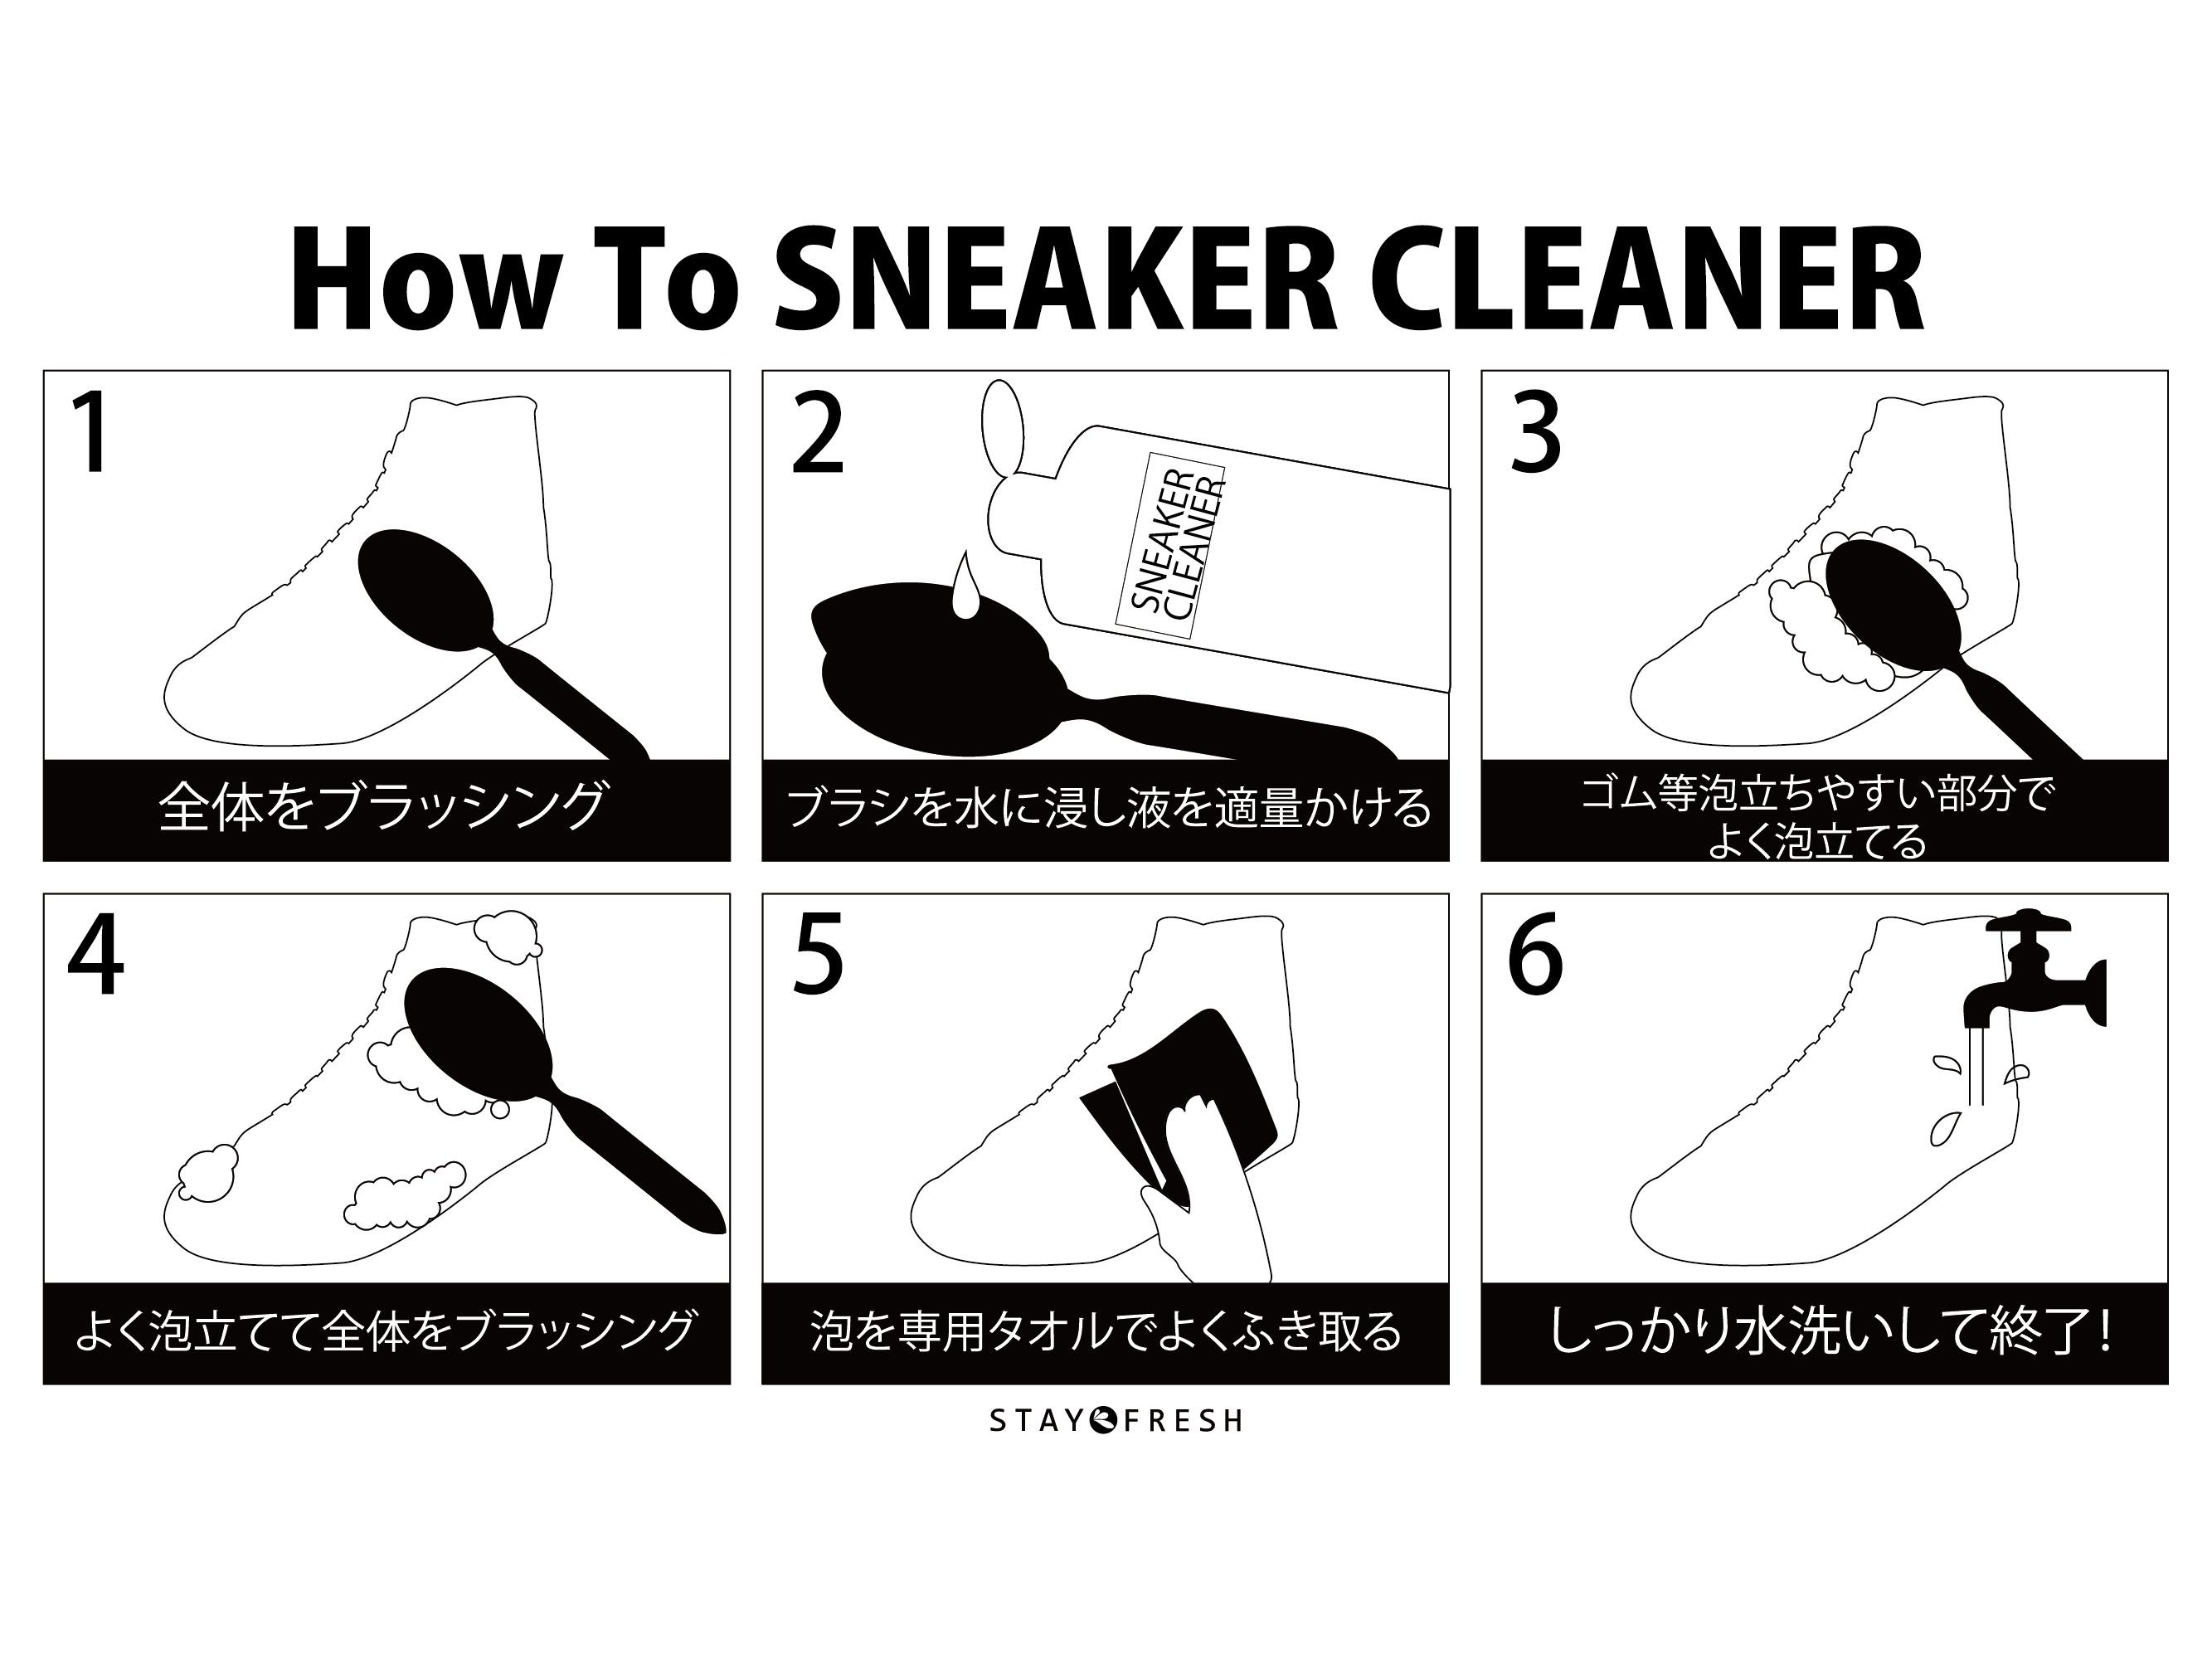 STAYFRESH SNEAKER CLEANER BOTTLE 250mlの商品画像-2